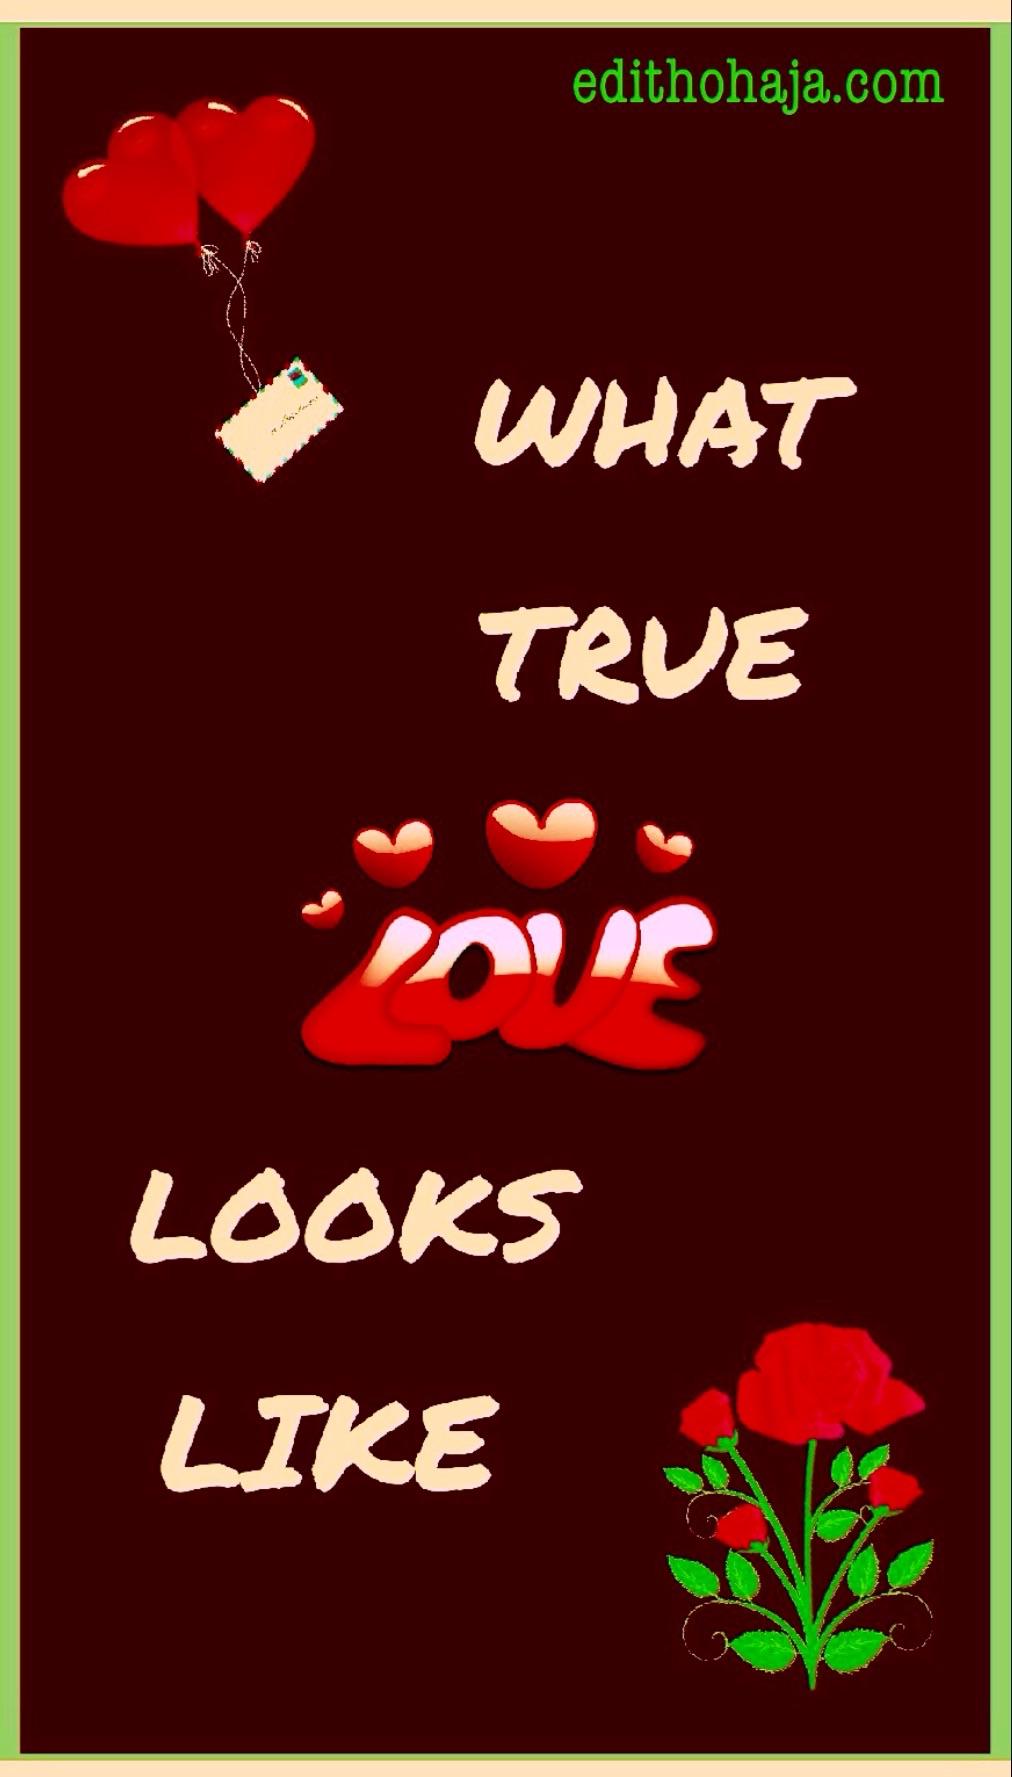 WHAT TRUE LOVE LOOKS LIKE (POEM)